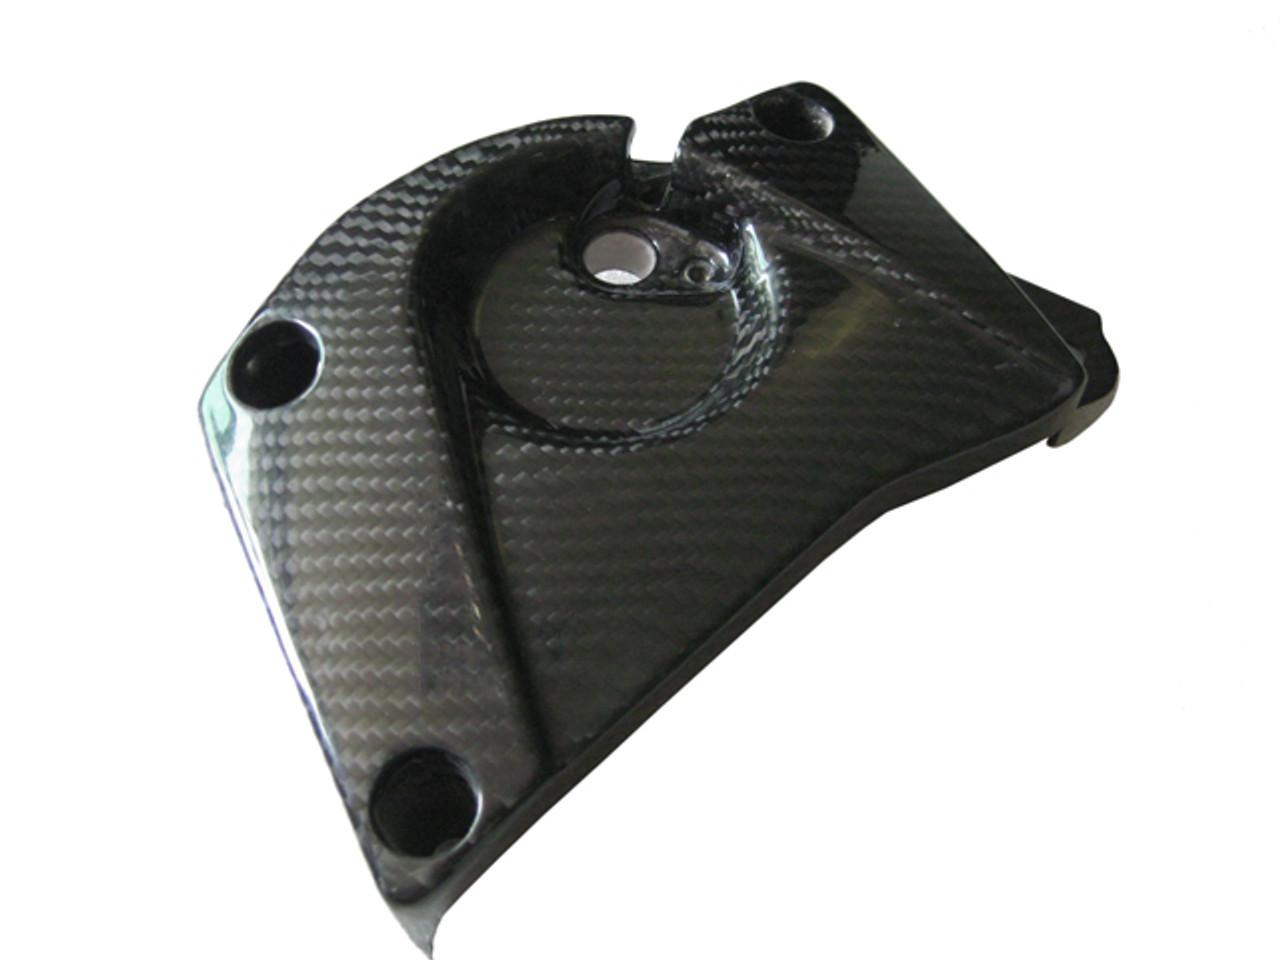 Glossy Plain Weave Carbon Fiber Front Sprocket Cover for BMW S1000RR 2009-2014